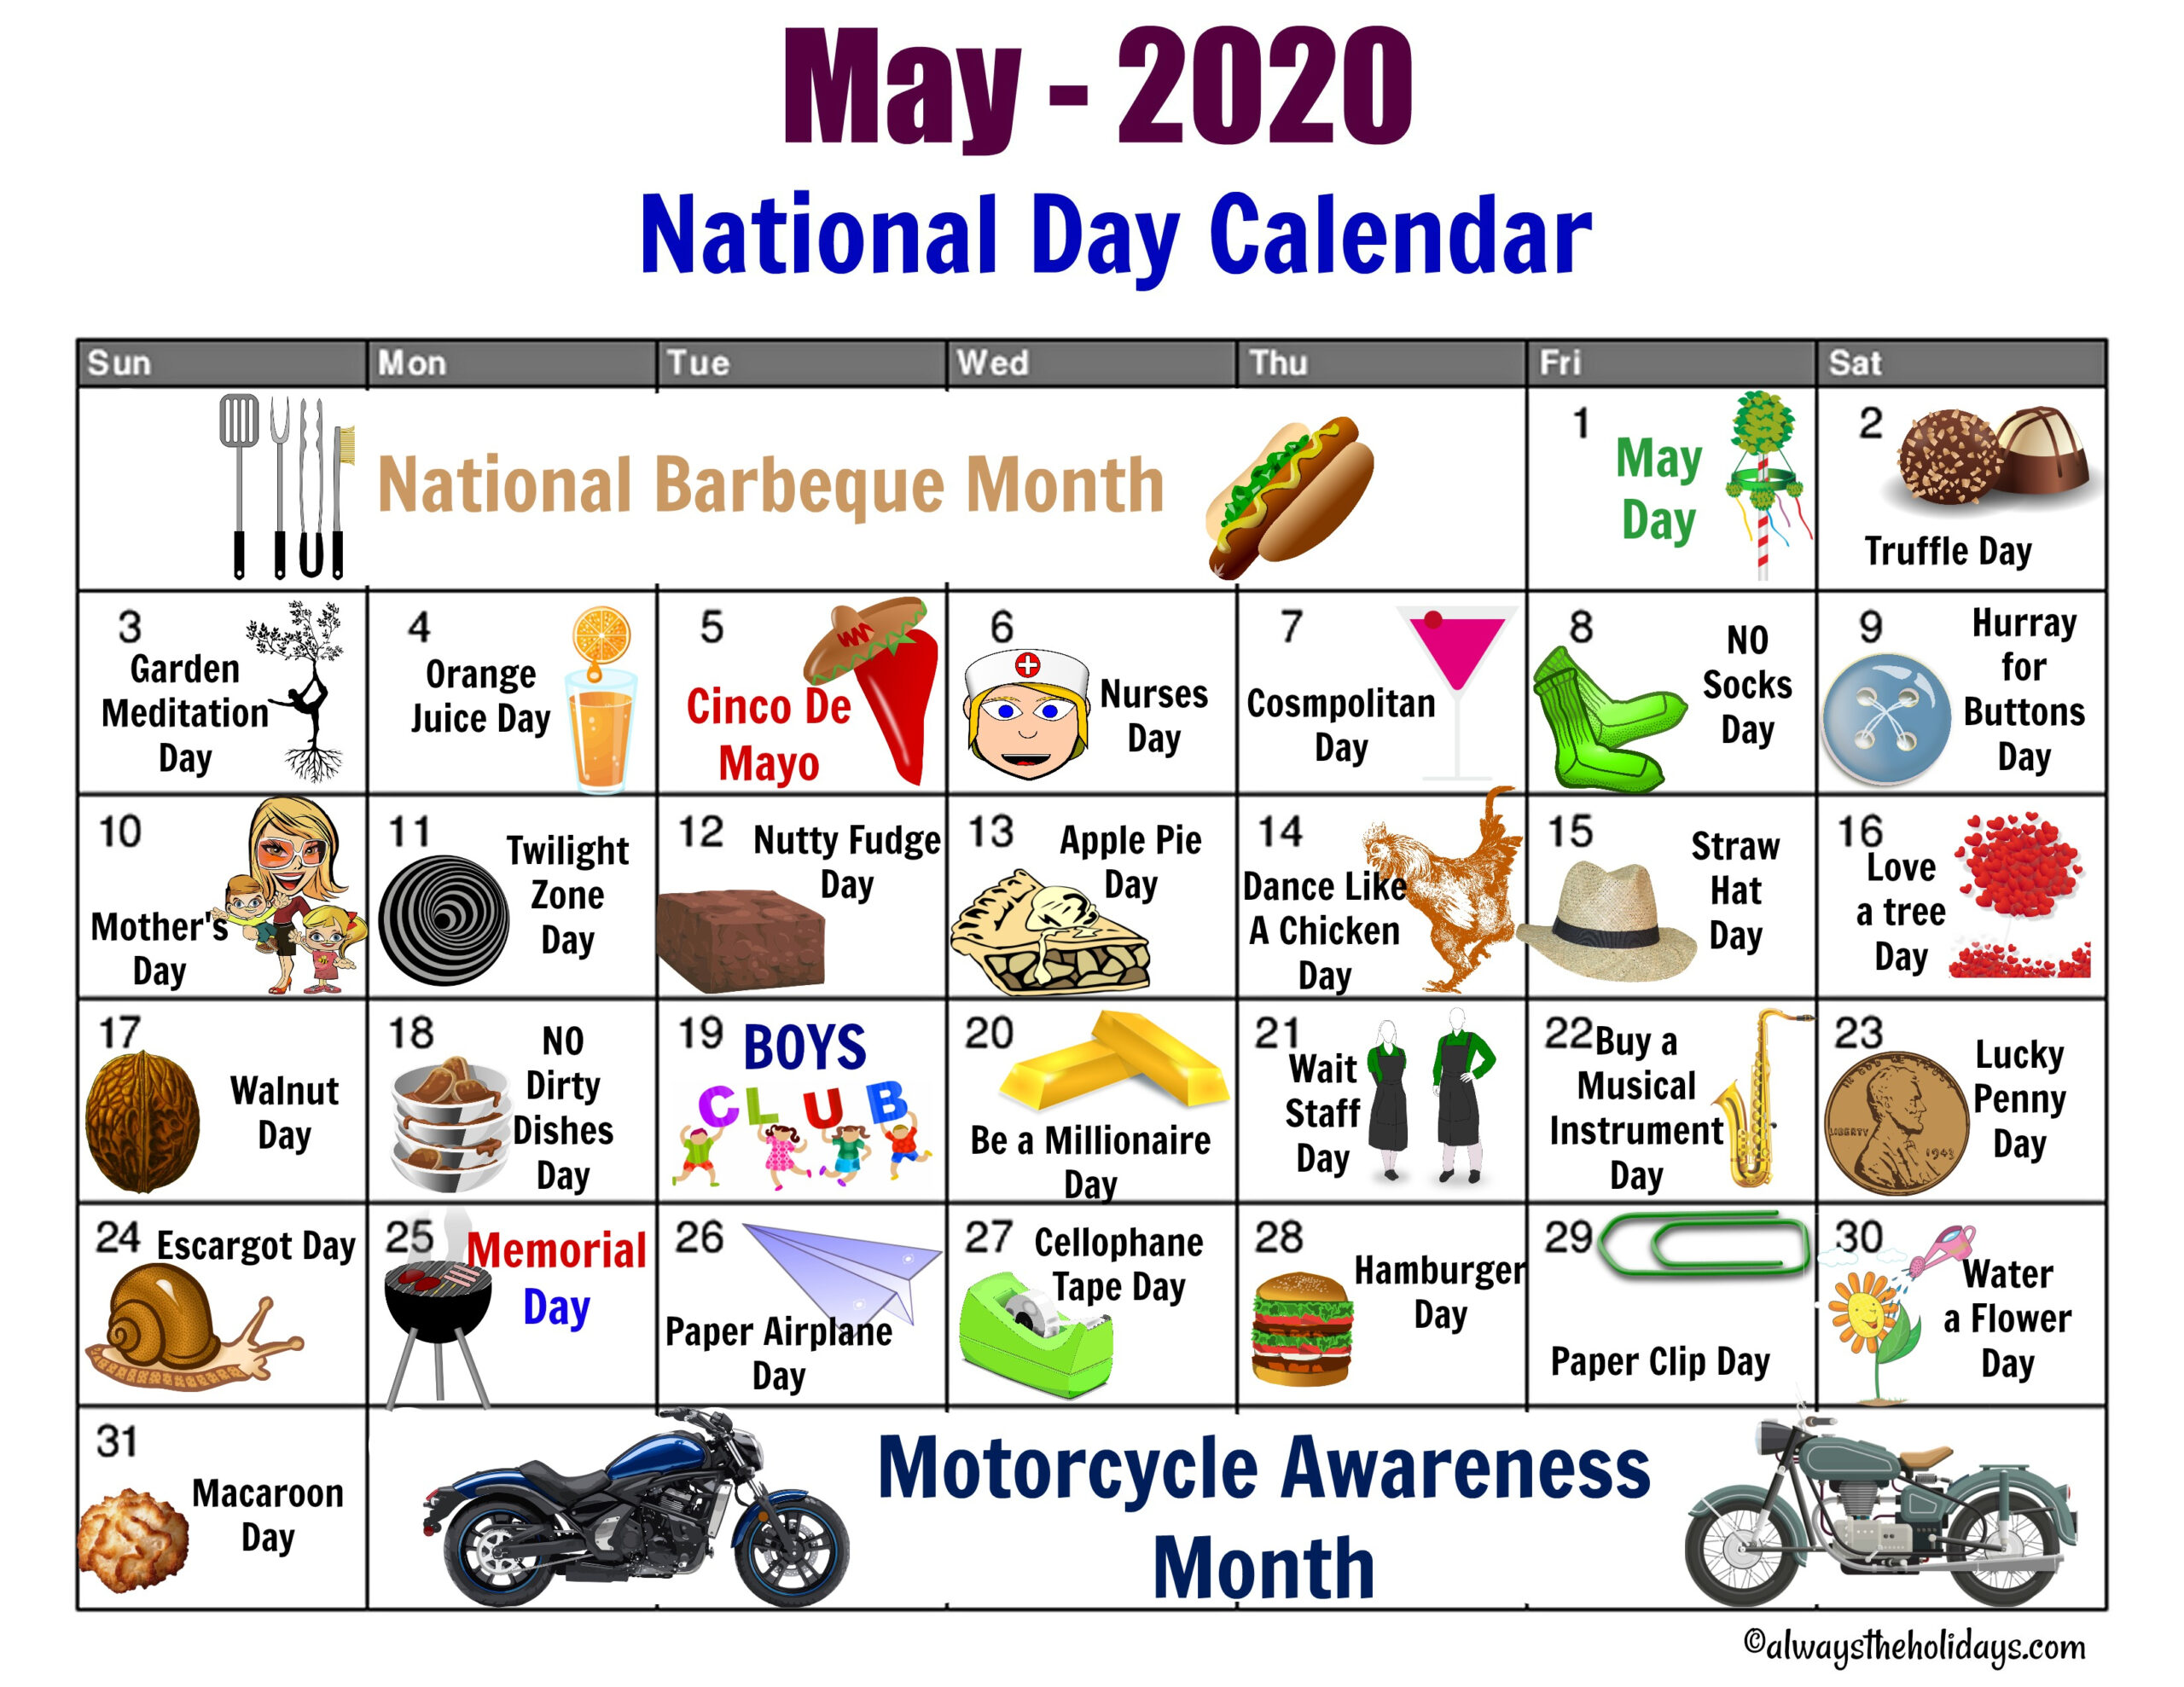 May National Day Calendar - Free Printable - Always The Holidays within Printable National Day Calendar 2021